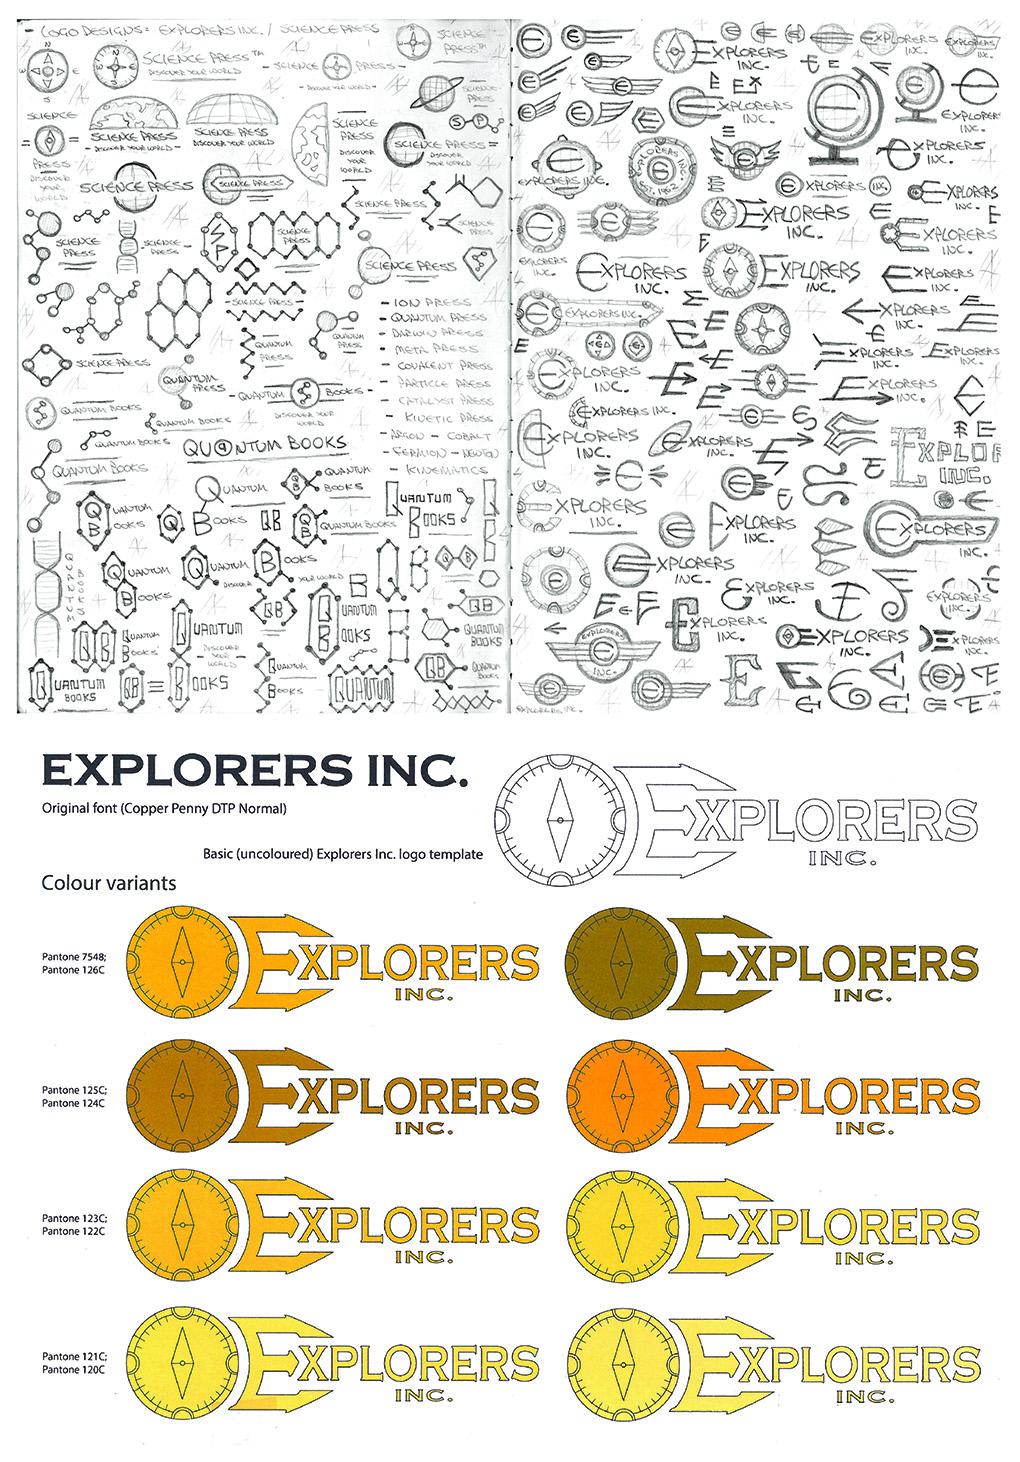 The Explorers Inc. logo!